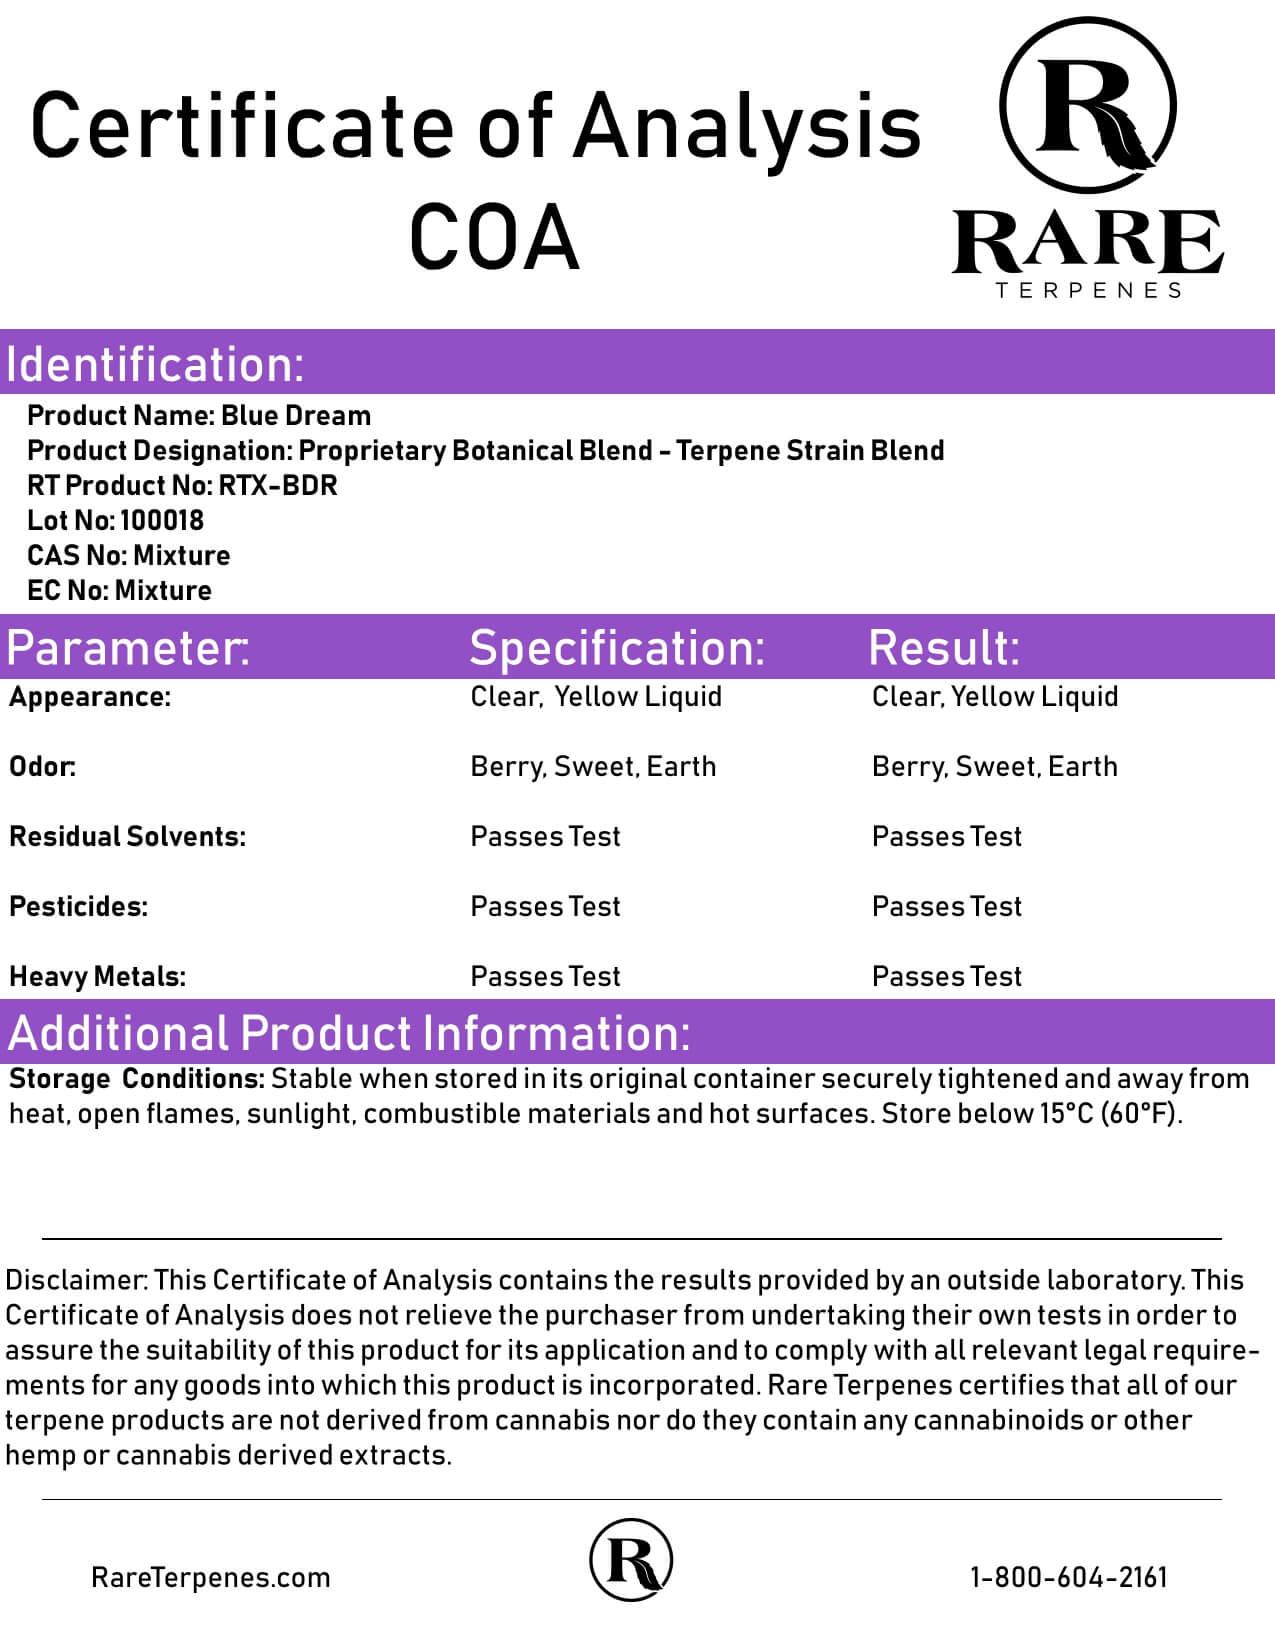 Rare Terpenes Tepene Strain Blends Blue Dream Lab Report